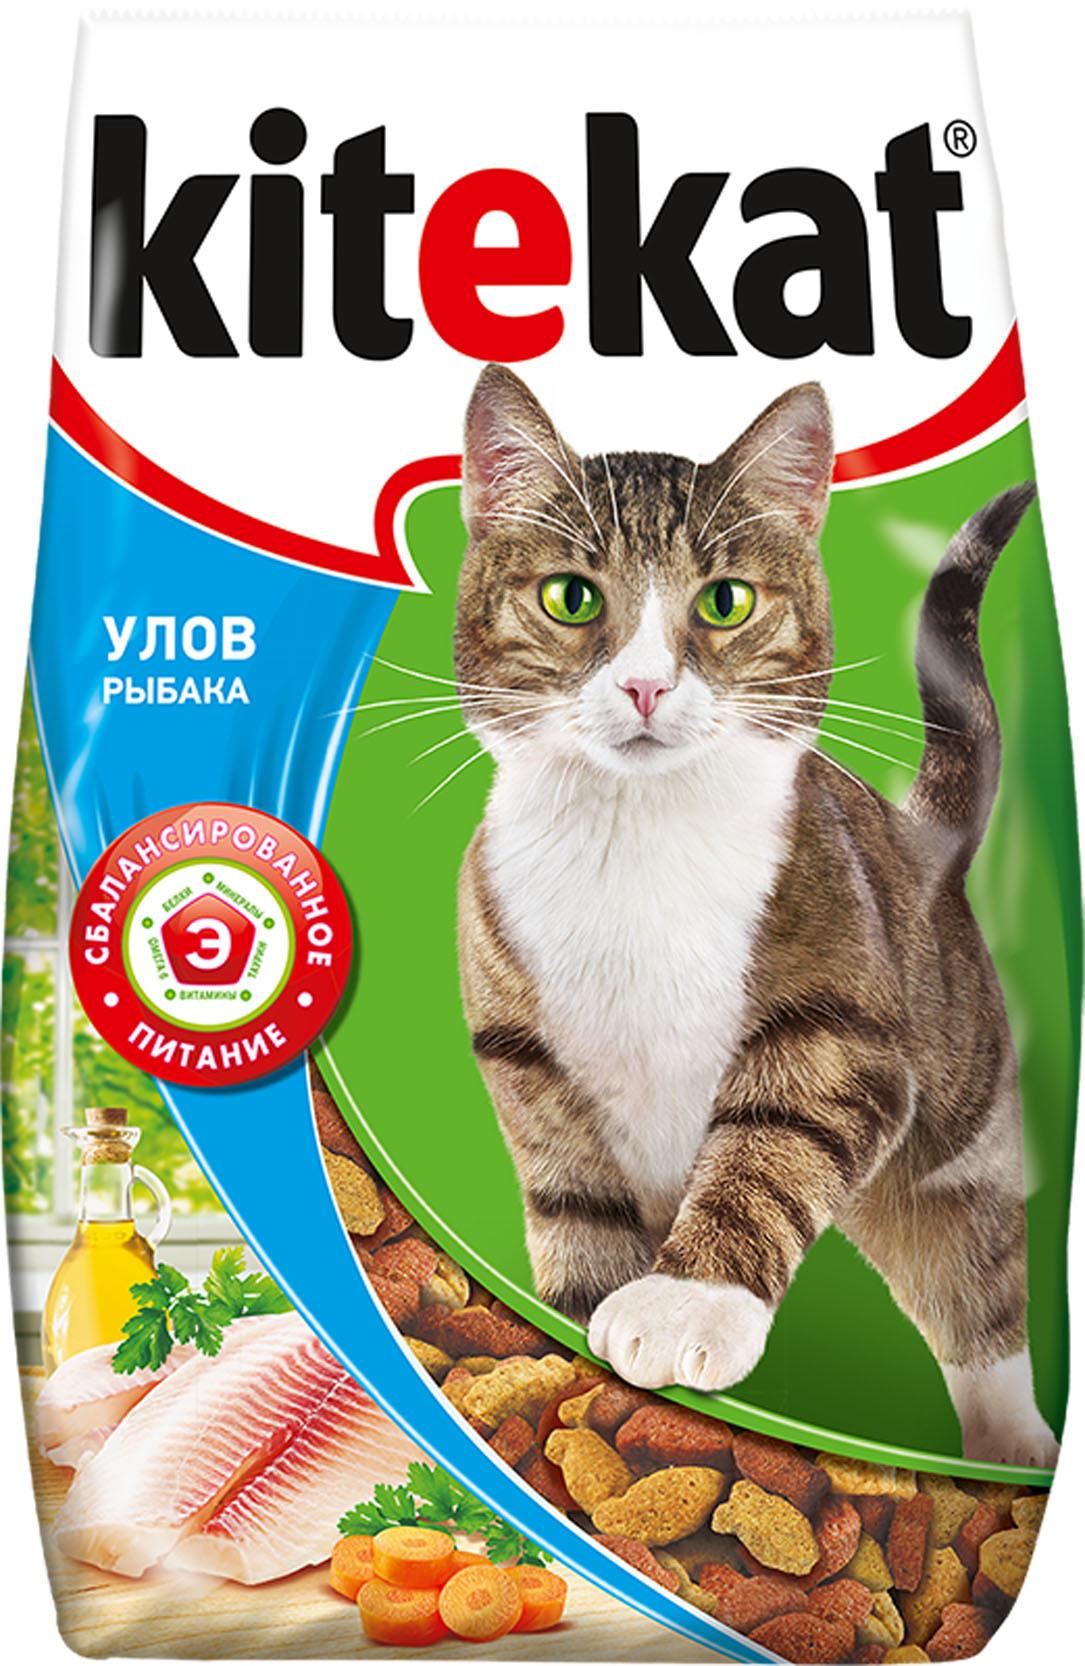 Корм сухой для взрослых кошек Kitekat, улов рыбака, 1,9 кг40435